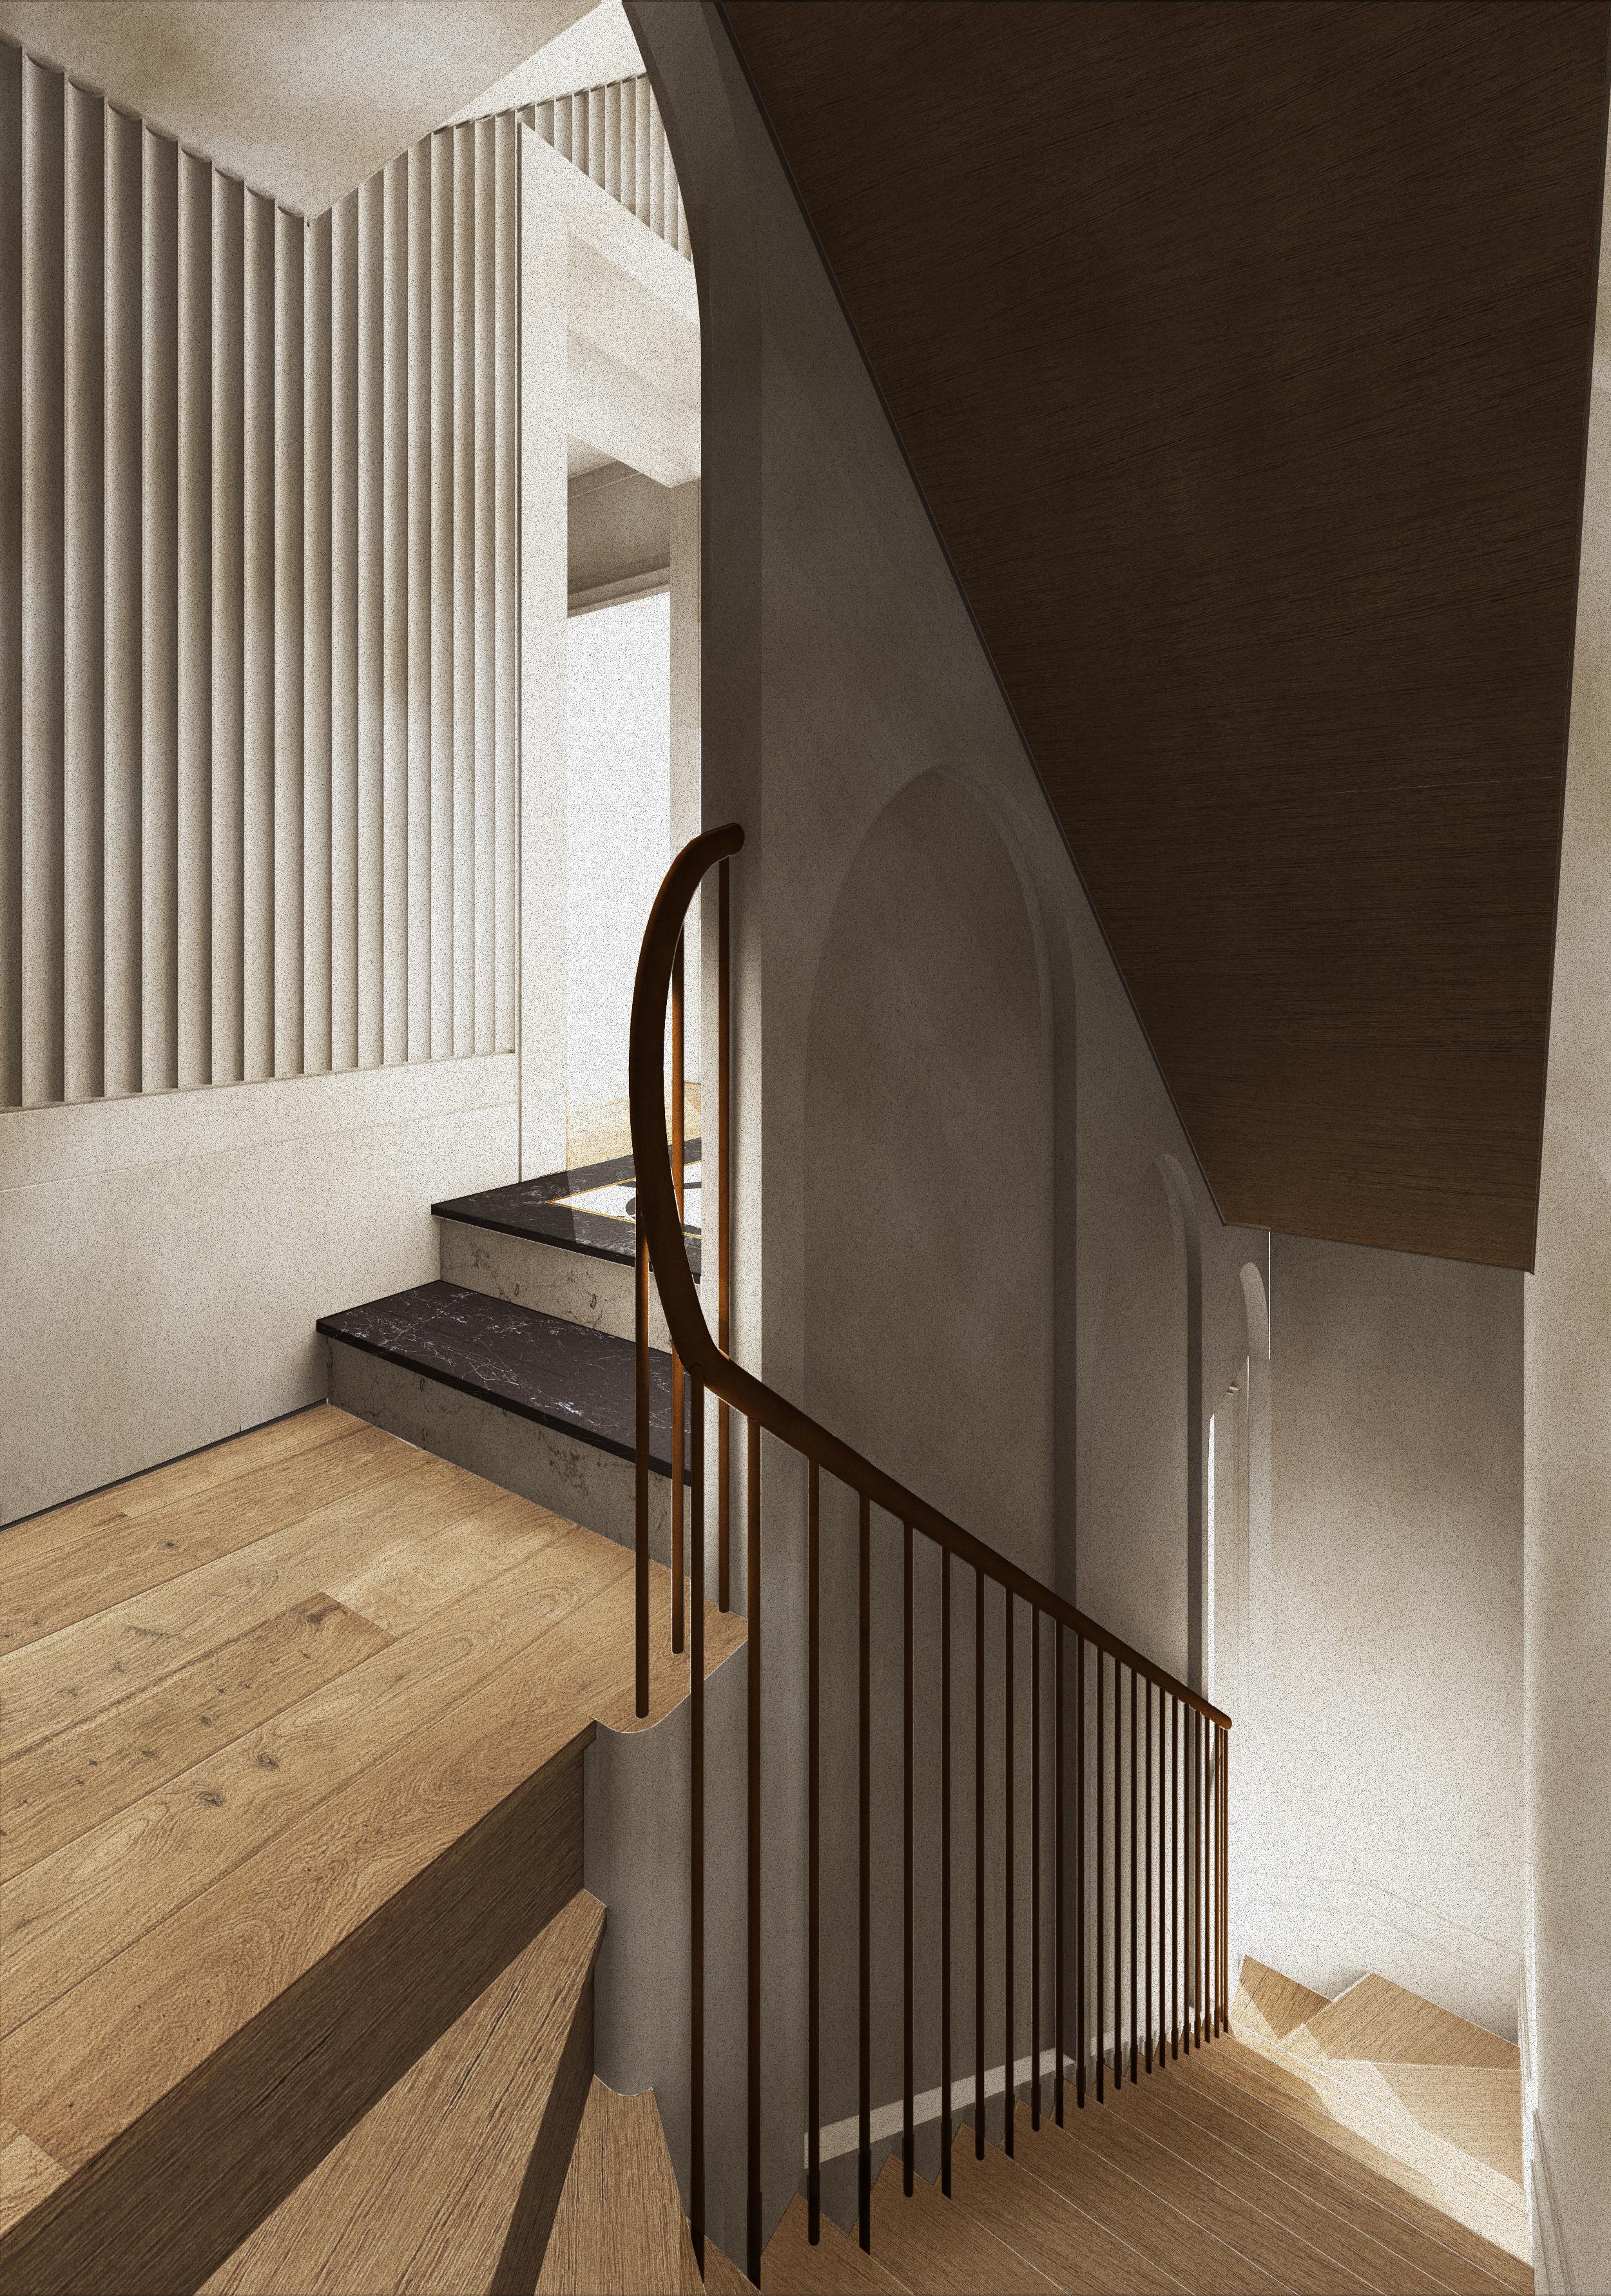 Basement Stair Render.jpg